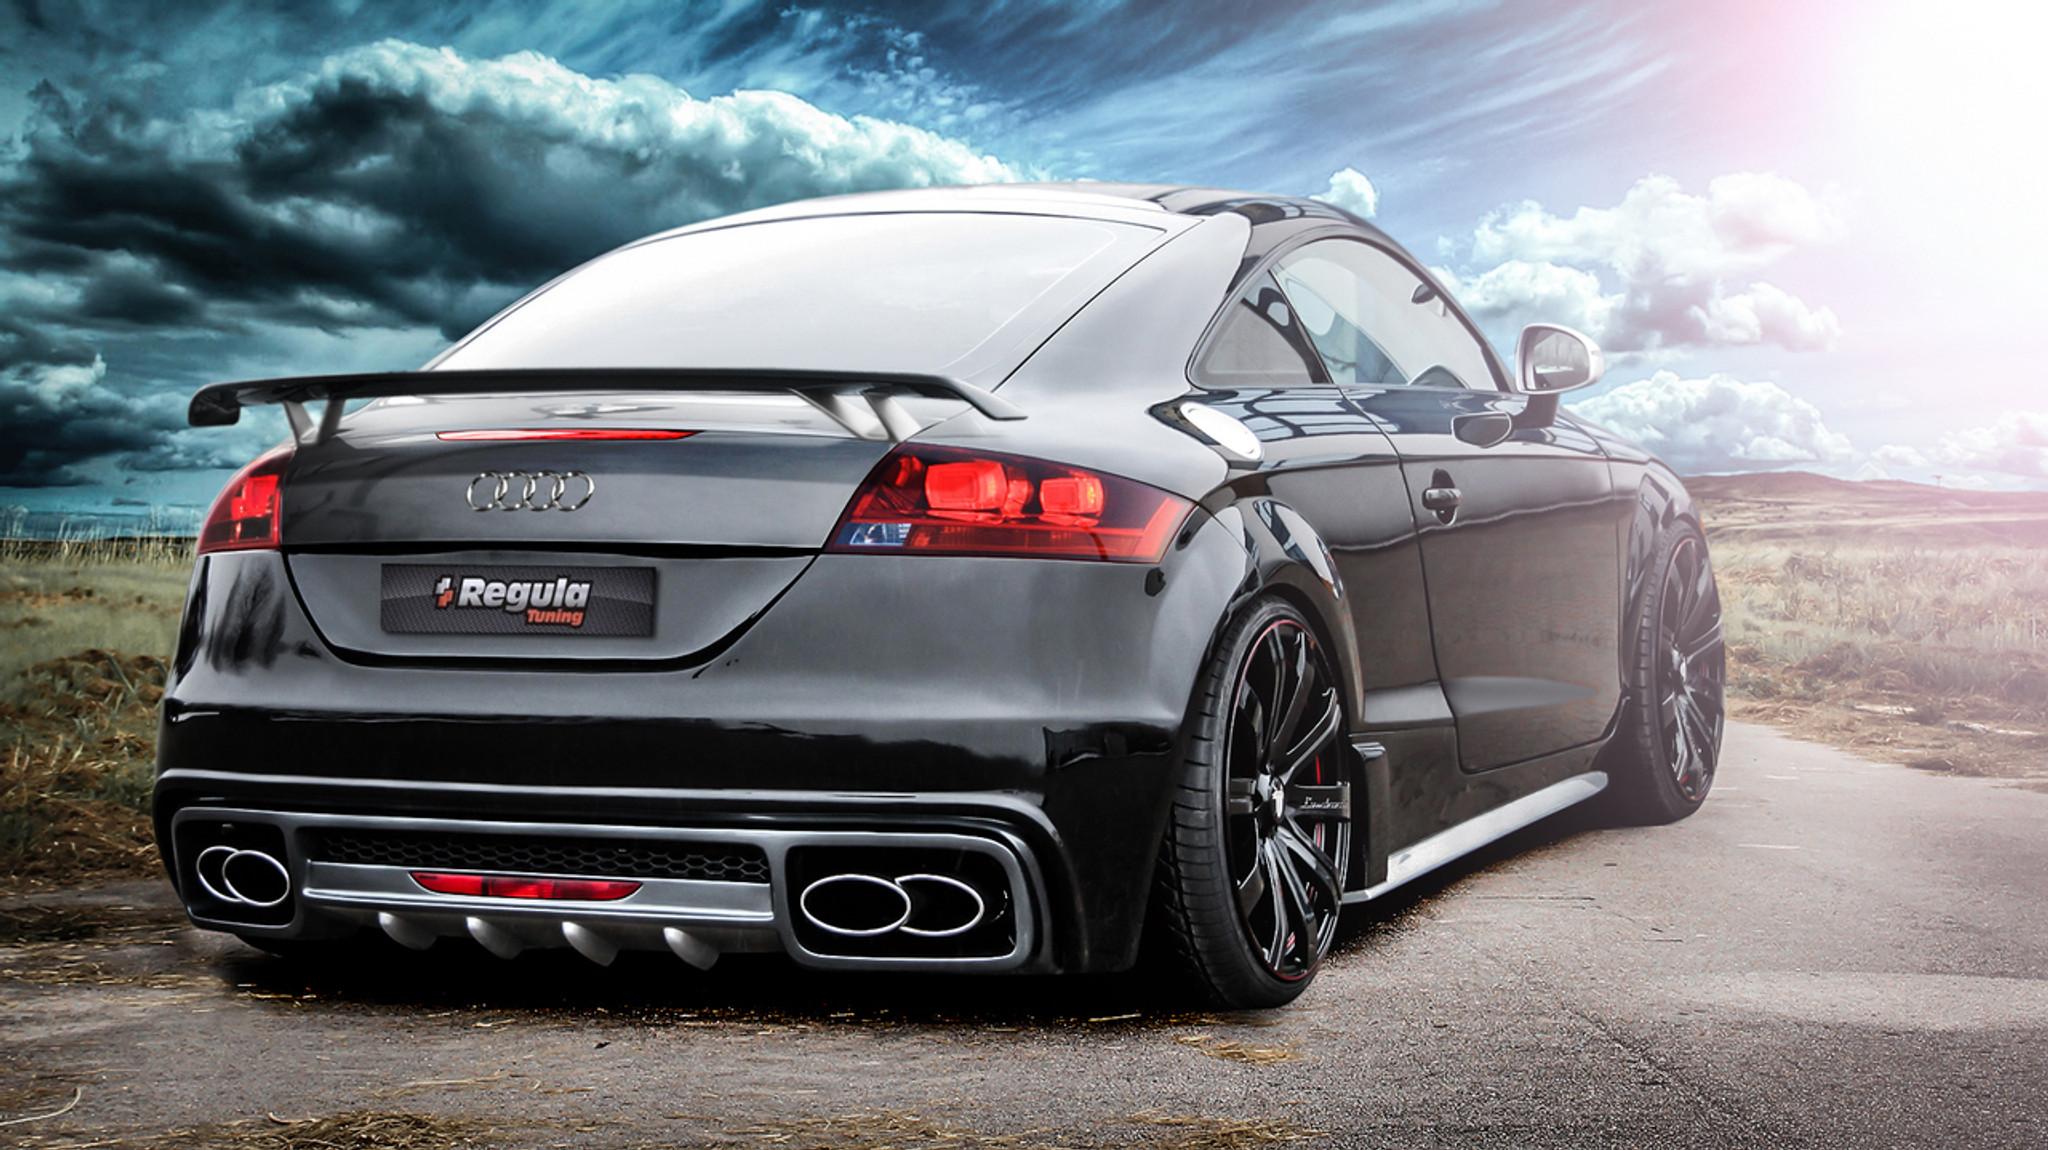 Audi Tt 8j Rs Body Kit Meduza Design Ltd